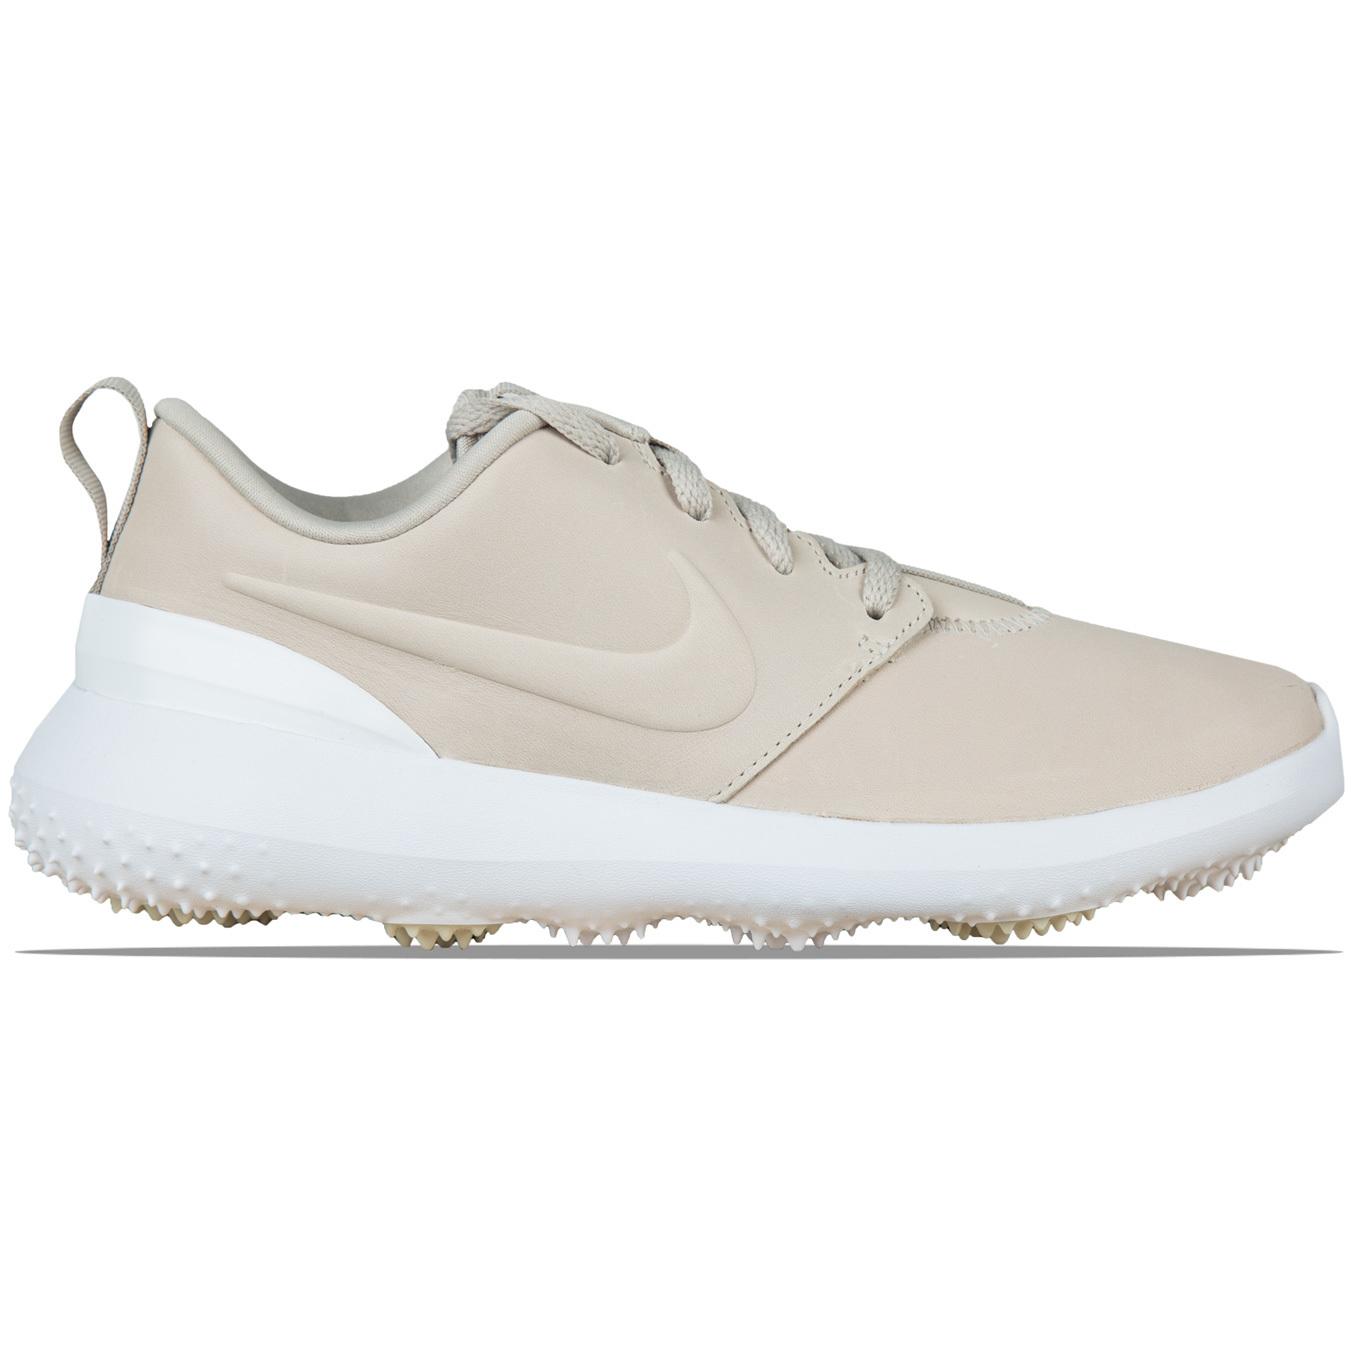 834eae8555c8a Nike Women s Roshe G AA1853-001